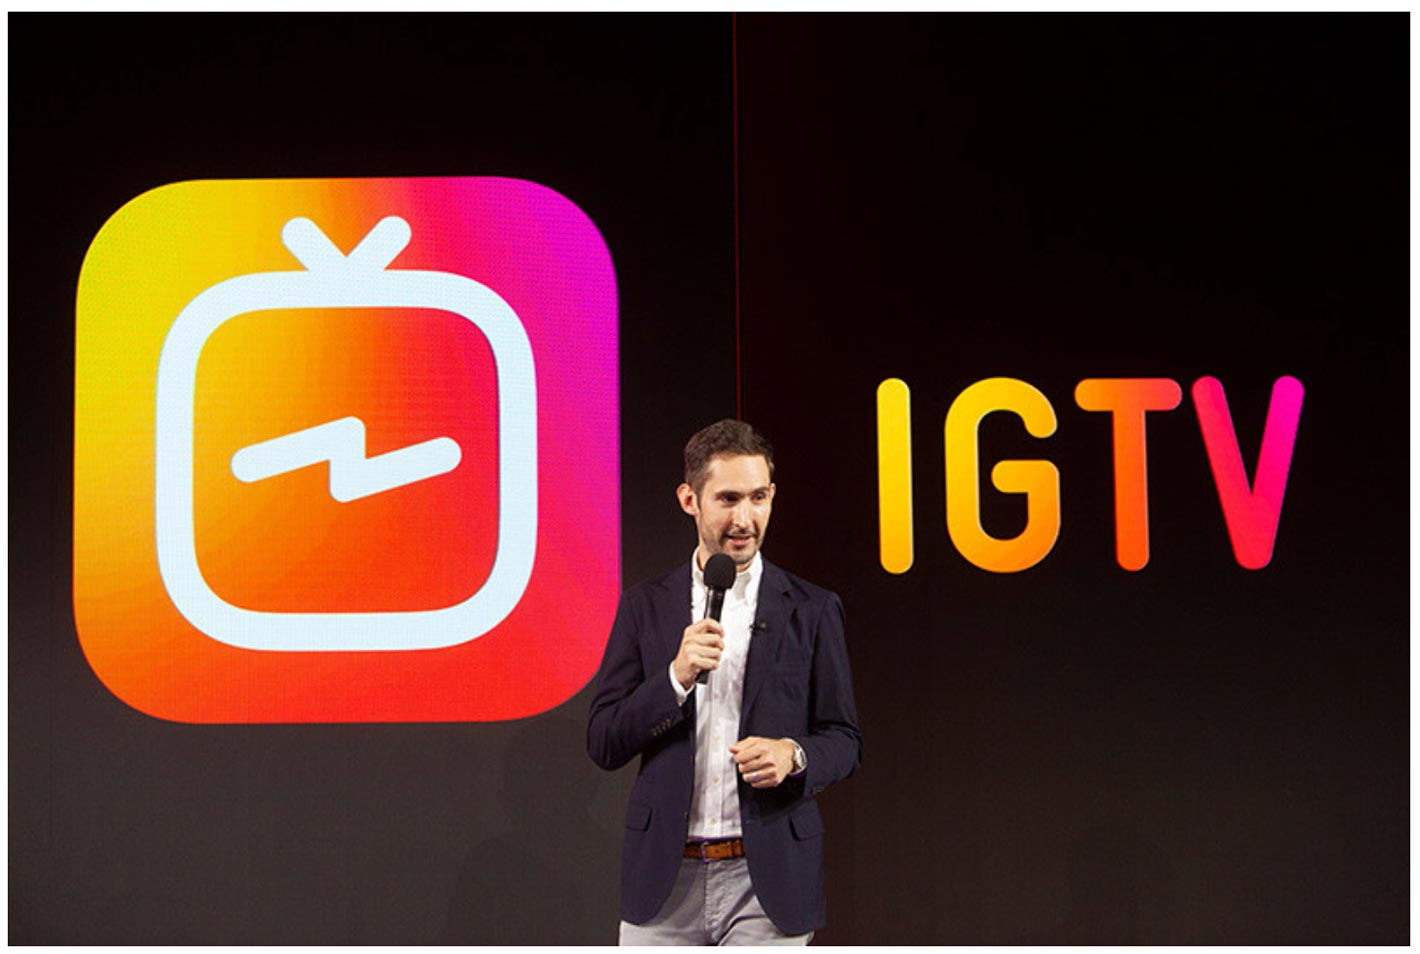 Instagram、最大1時間までの縦動画を視聴ができるiOSアプリ「IGTV」リリース